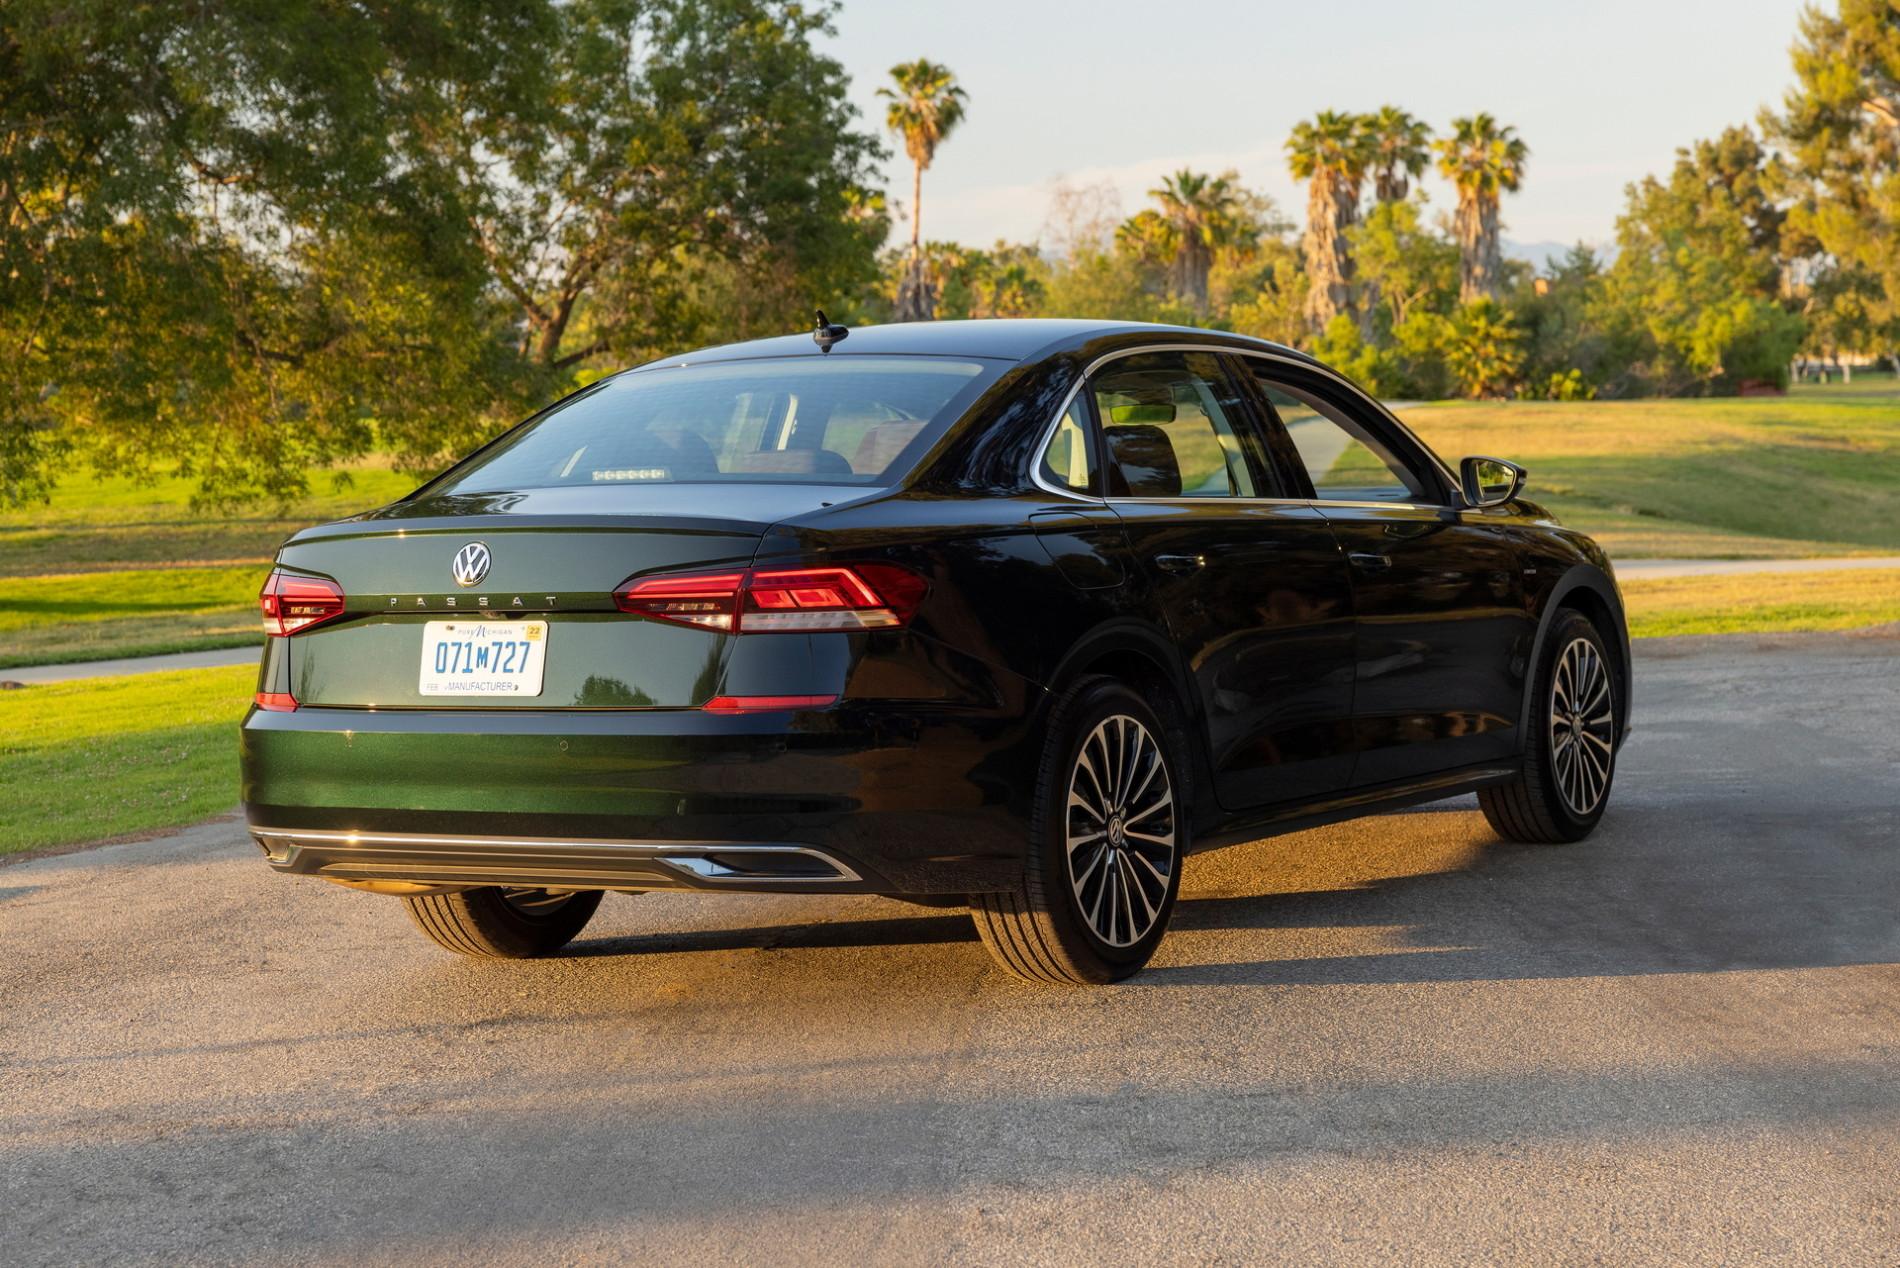 VW Passat Limited Edition - VW Passat Limited Edition